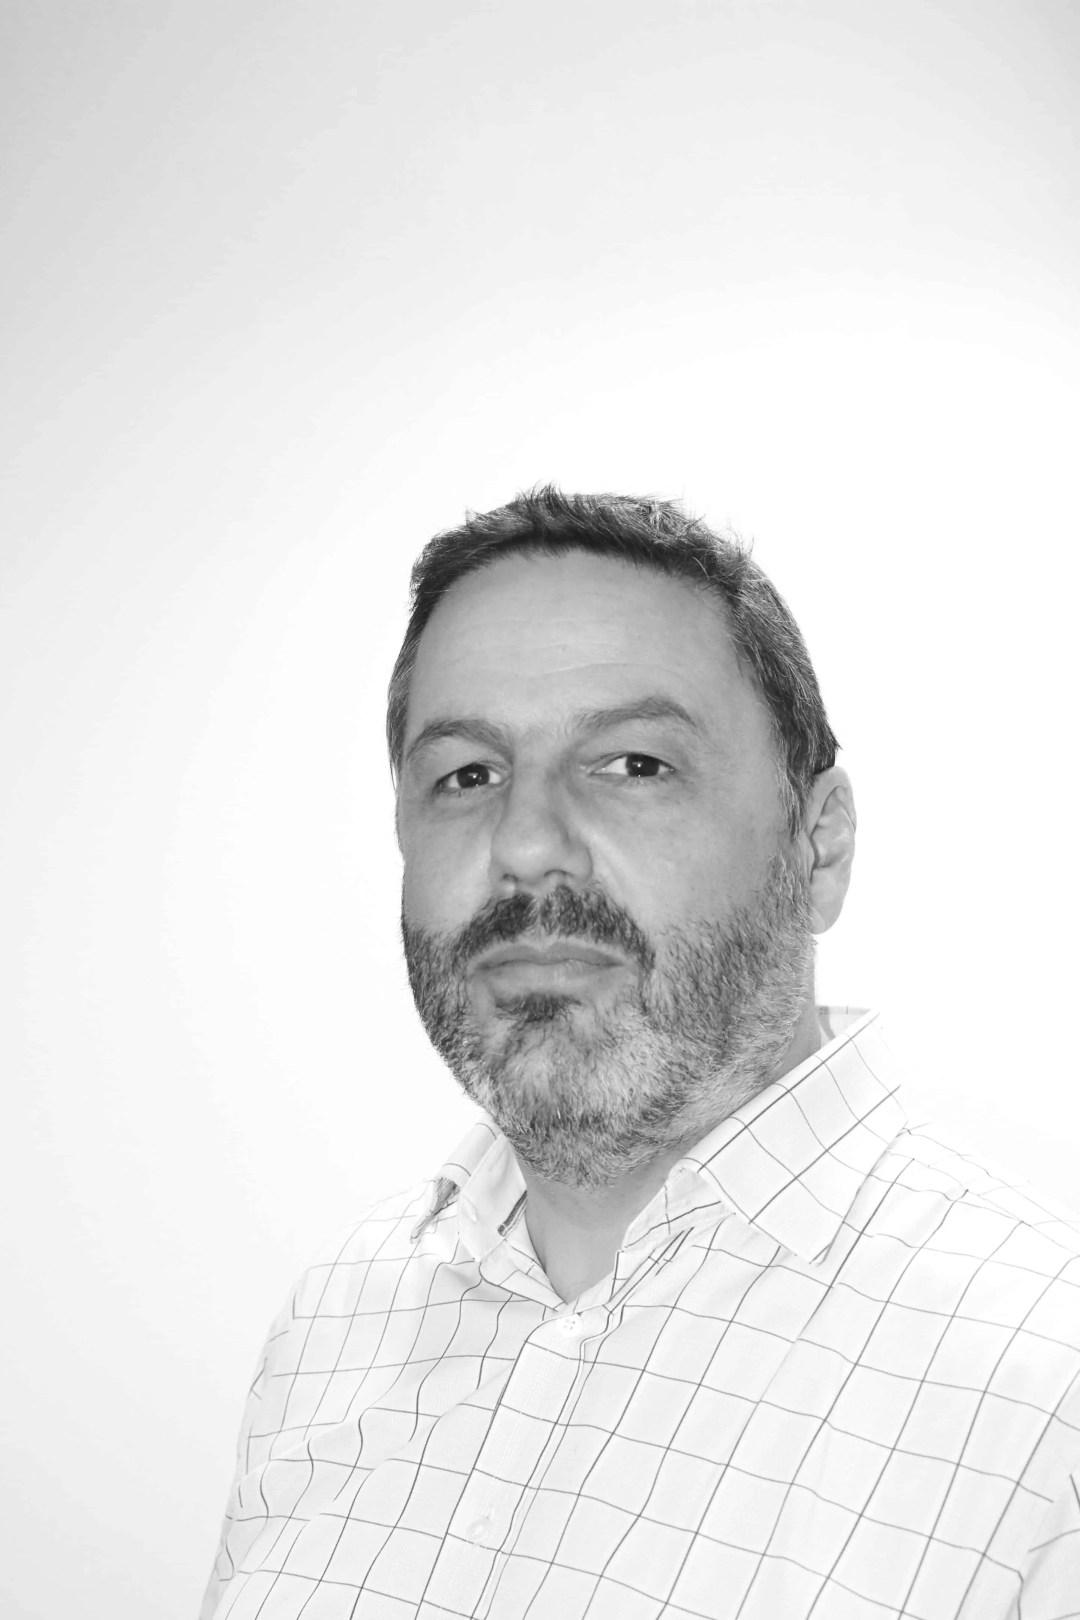 Richard Herne-Smith